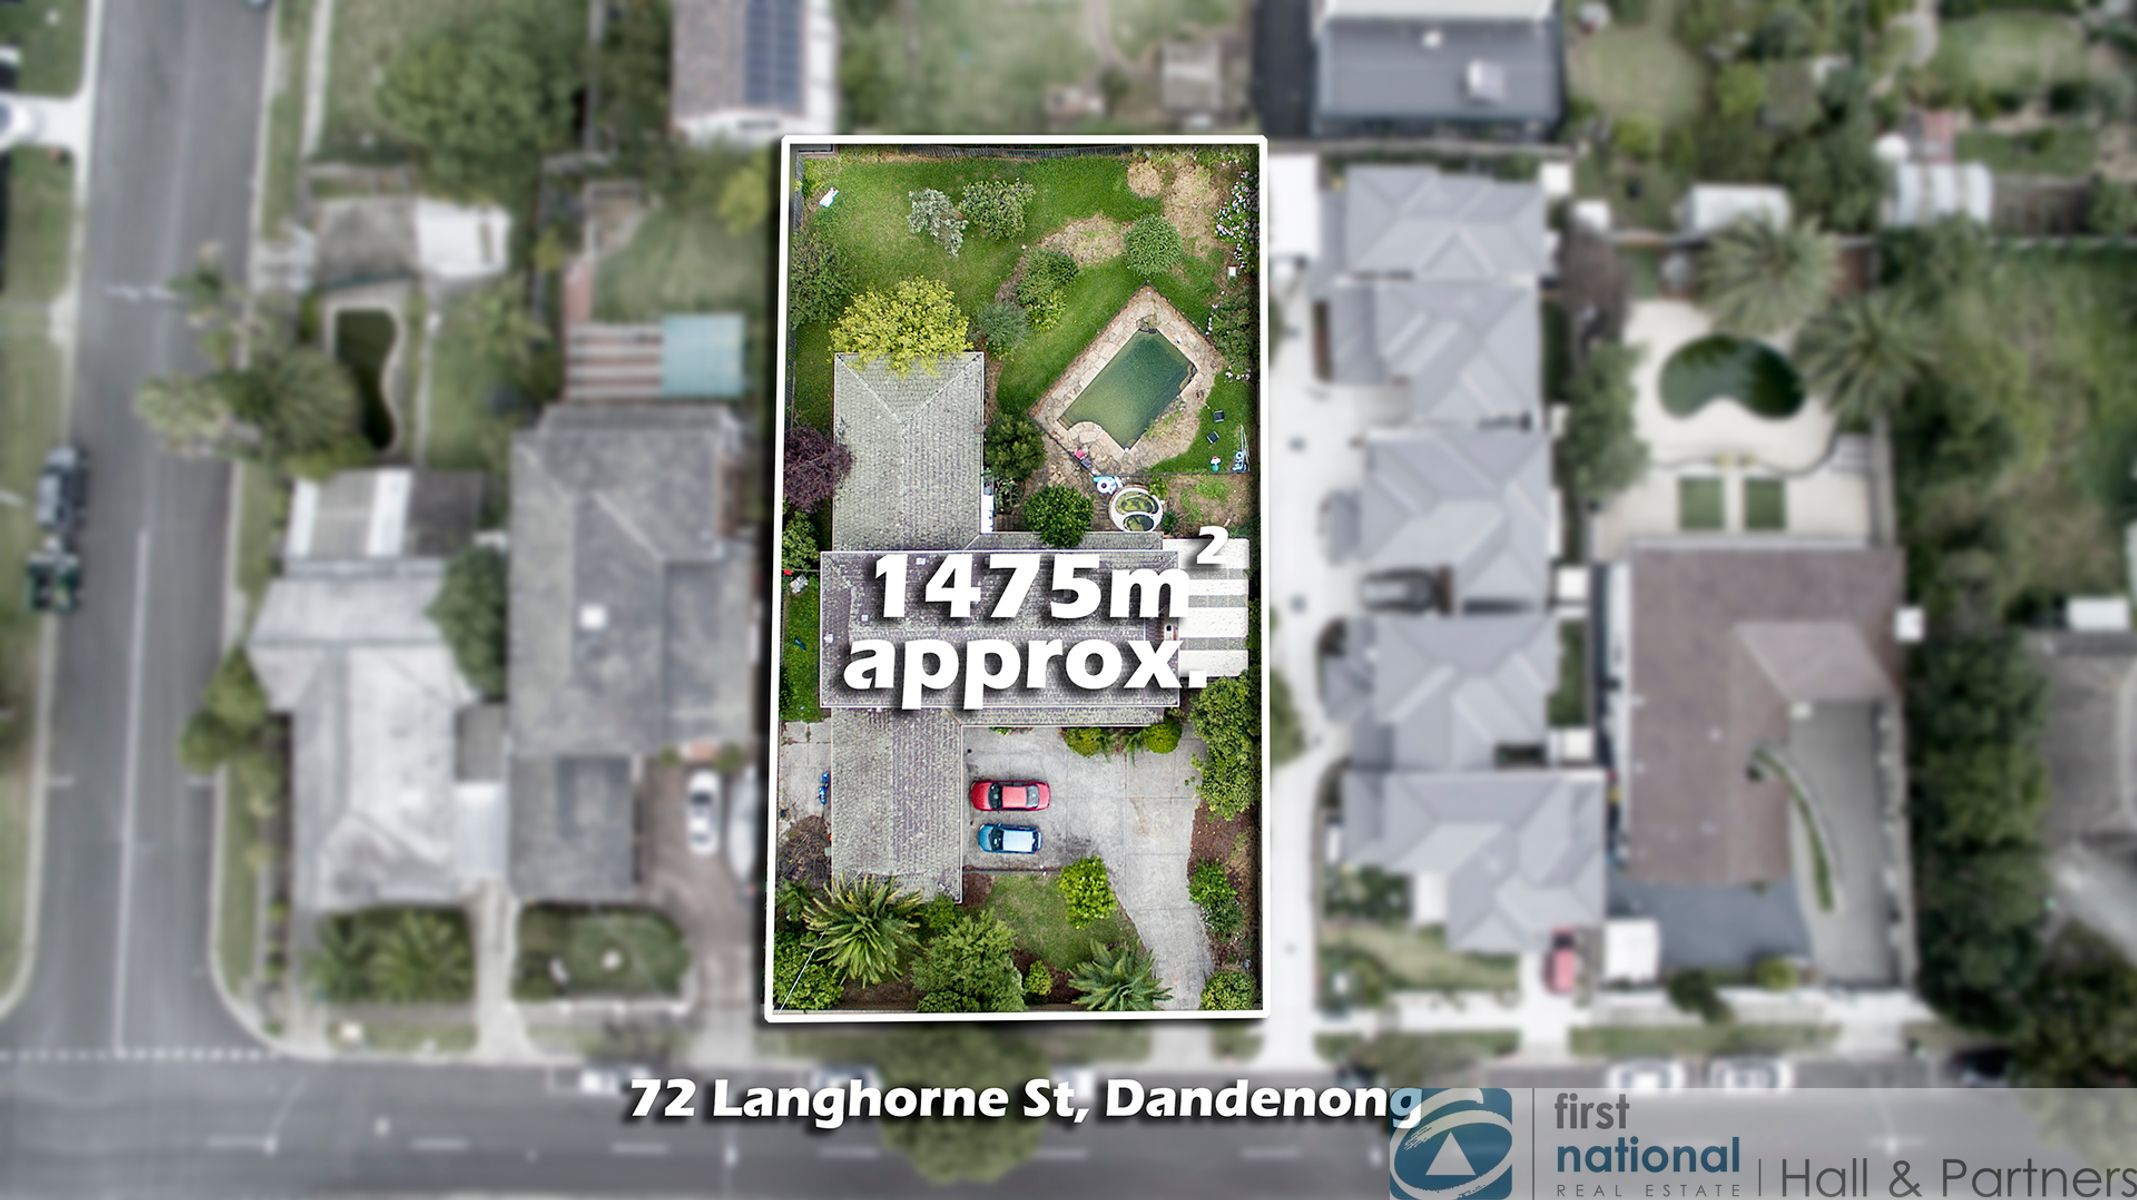 72 Langhorne Street, Dandenong, VIC 3175